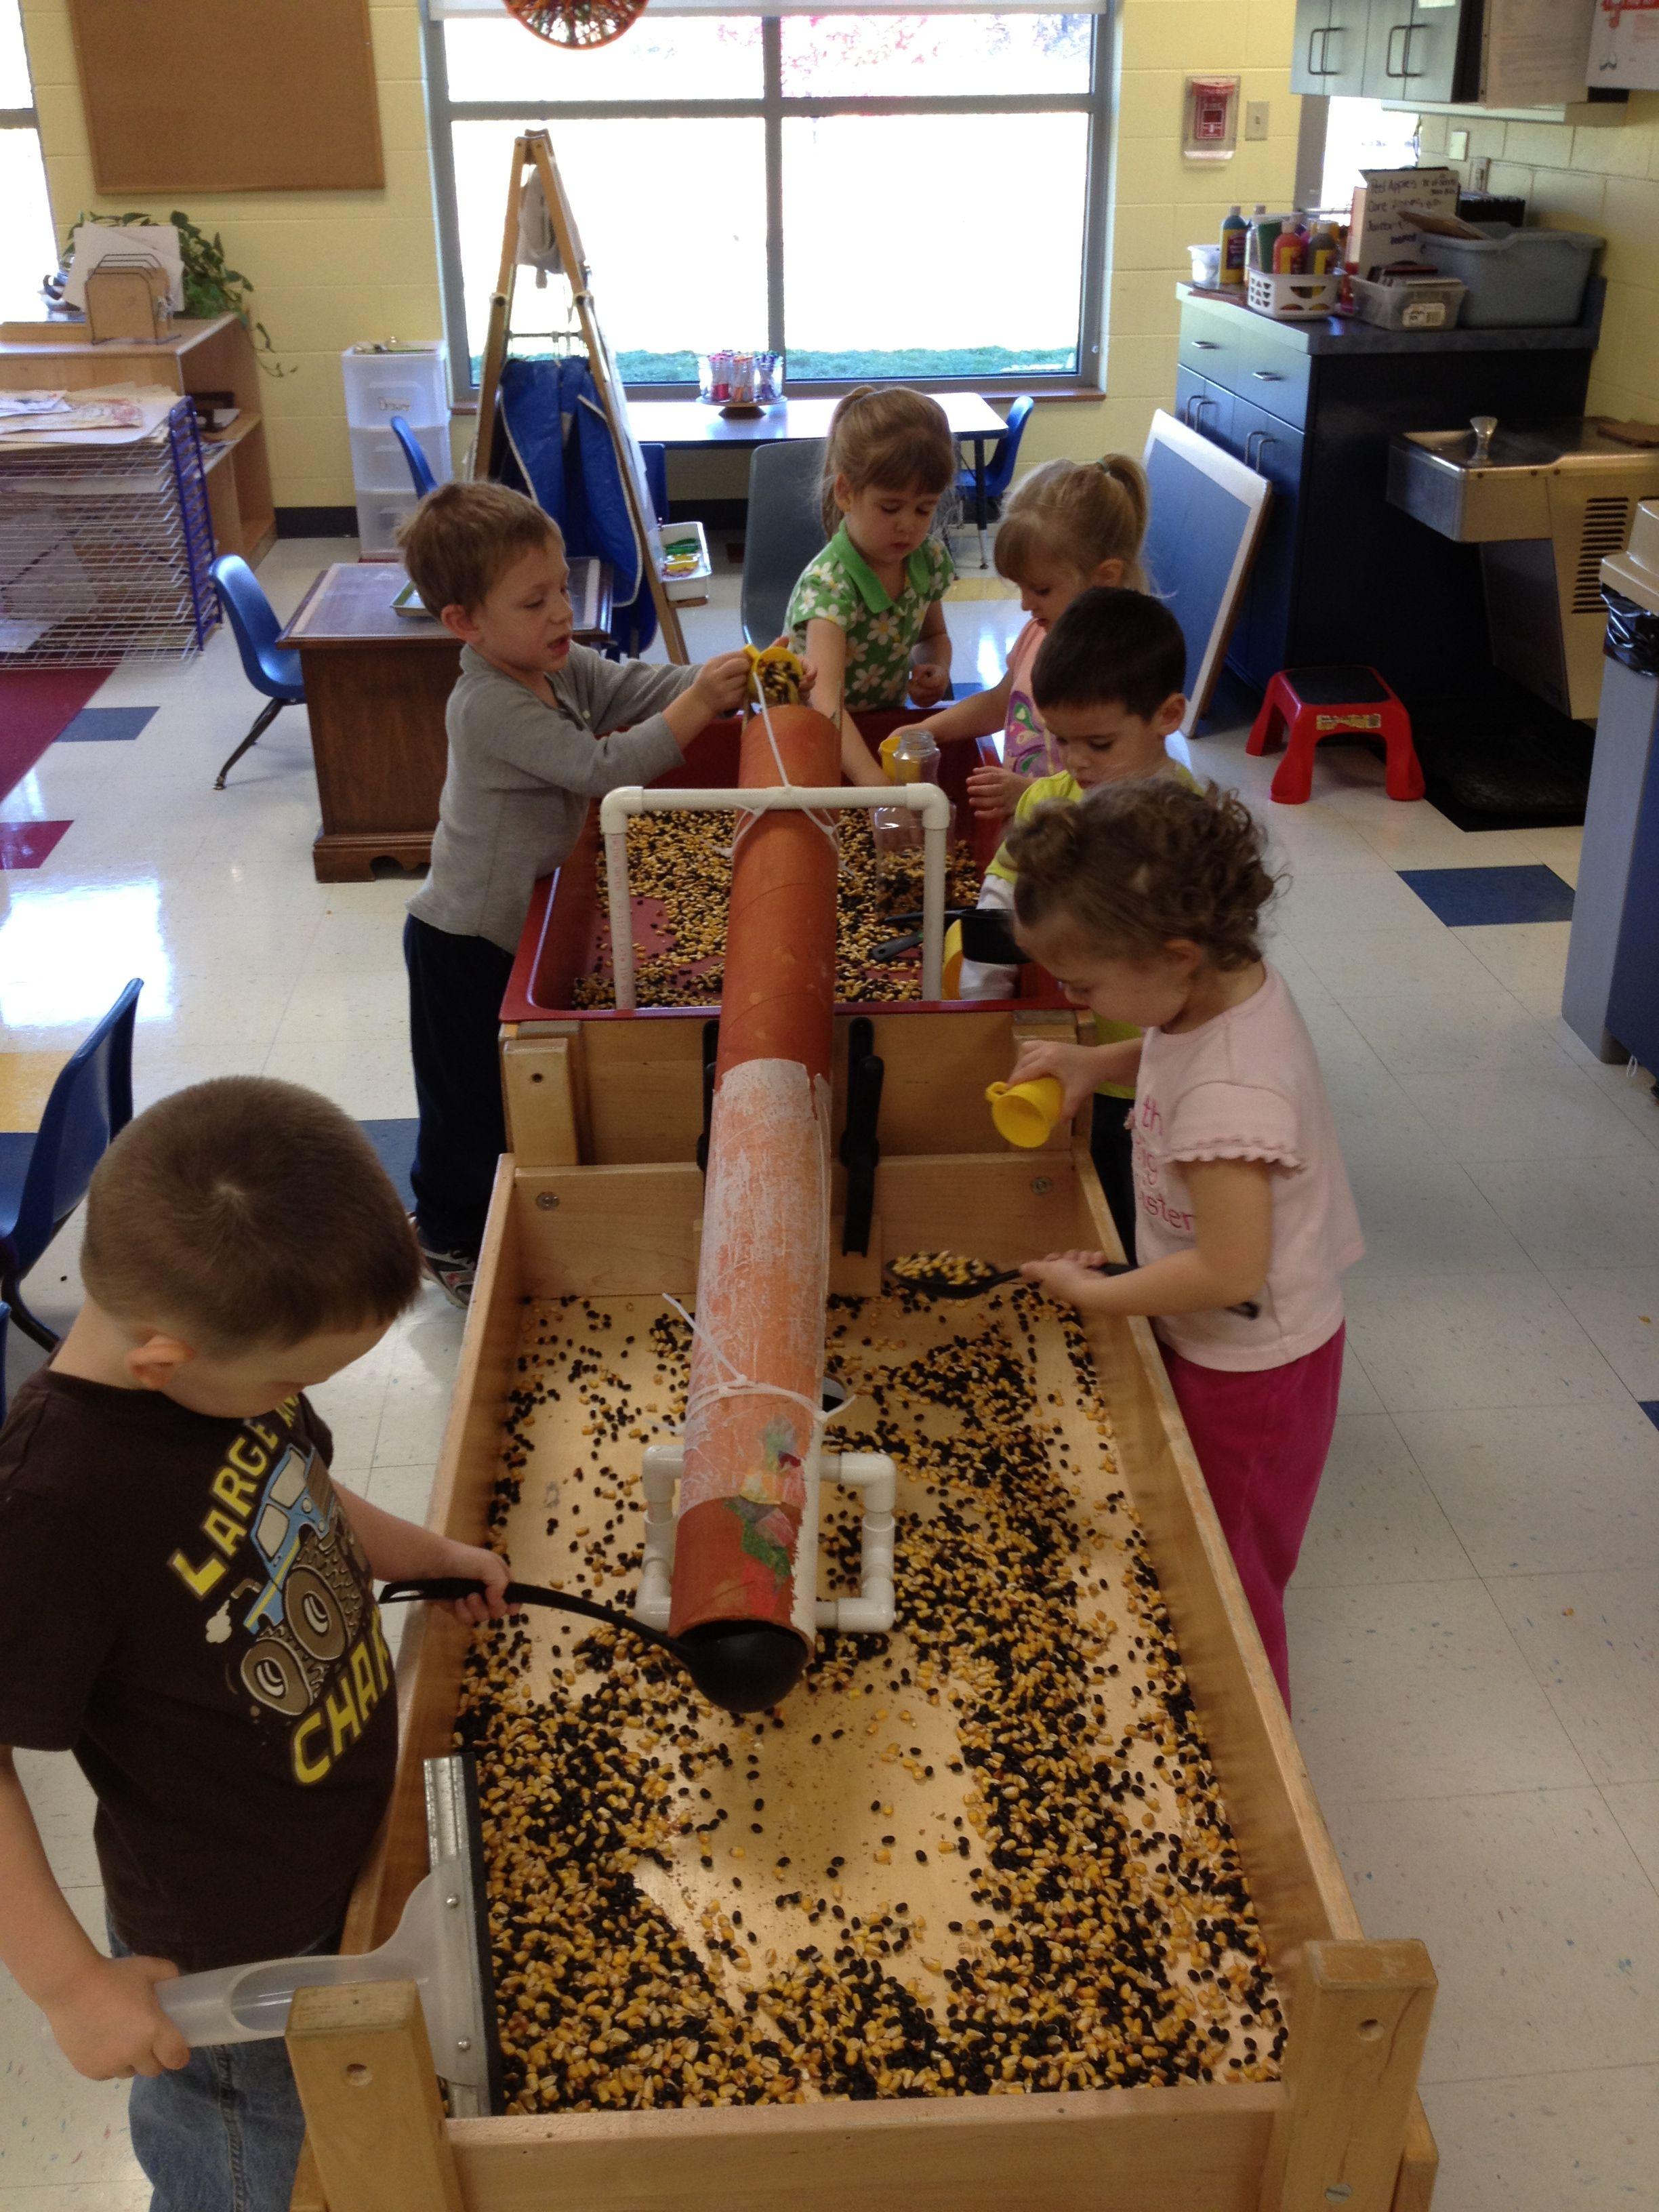 Day Nursery Avon Center Preschoolers Learn Through Sensory